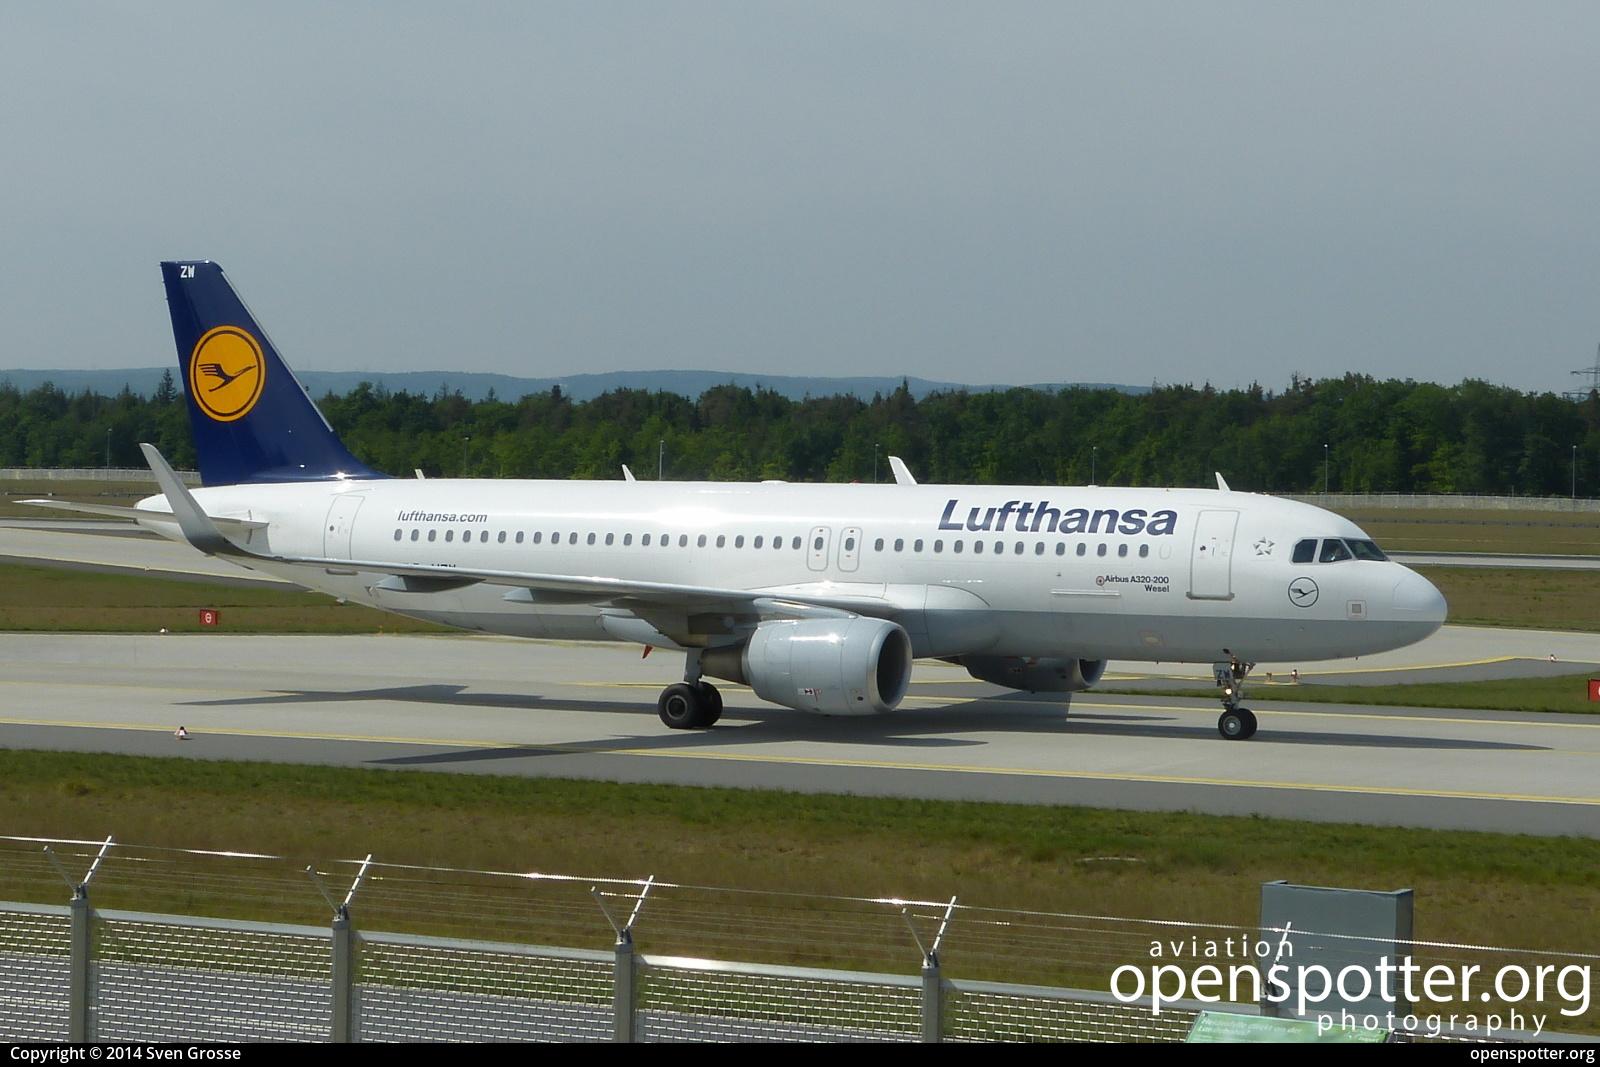 D-AIZW - Lufthansa Airbus A320-214(WL) at Frankfurt International Airport (FRA/EDDF) taken by Sven Grosse | openspotter.org | ID: 51514